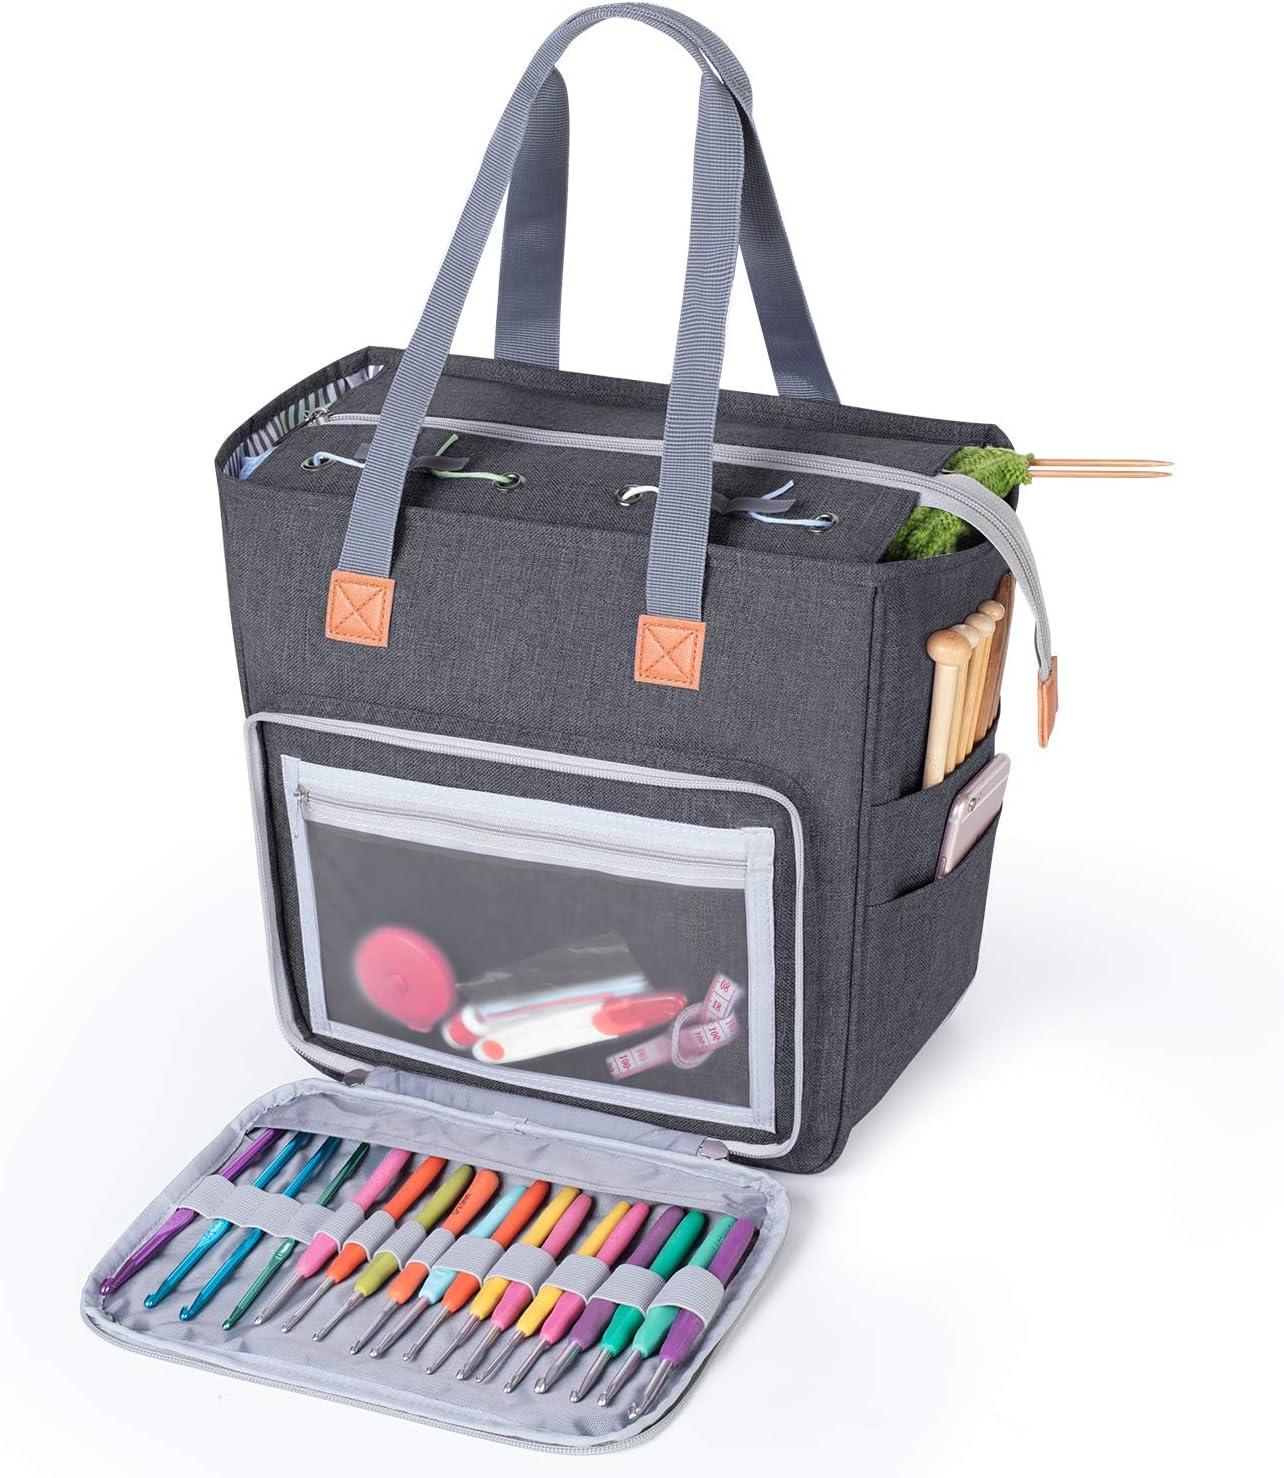 Luxja Knitting and Yarn Storage &Organizer Bag